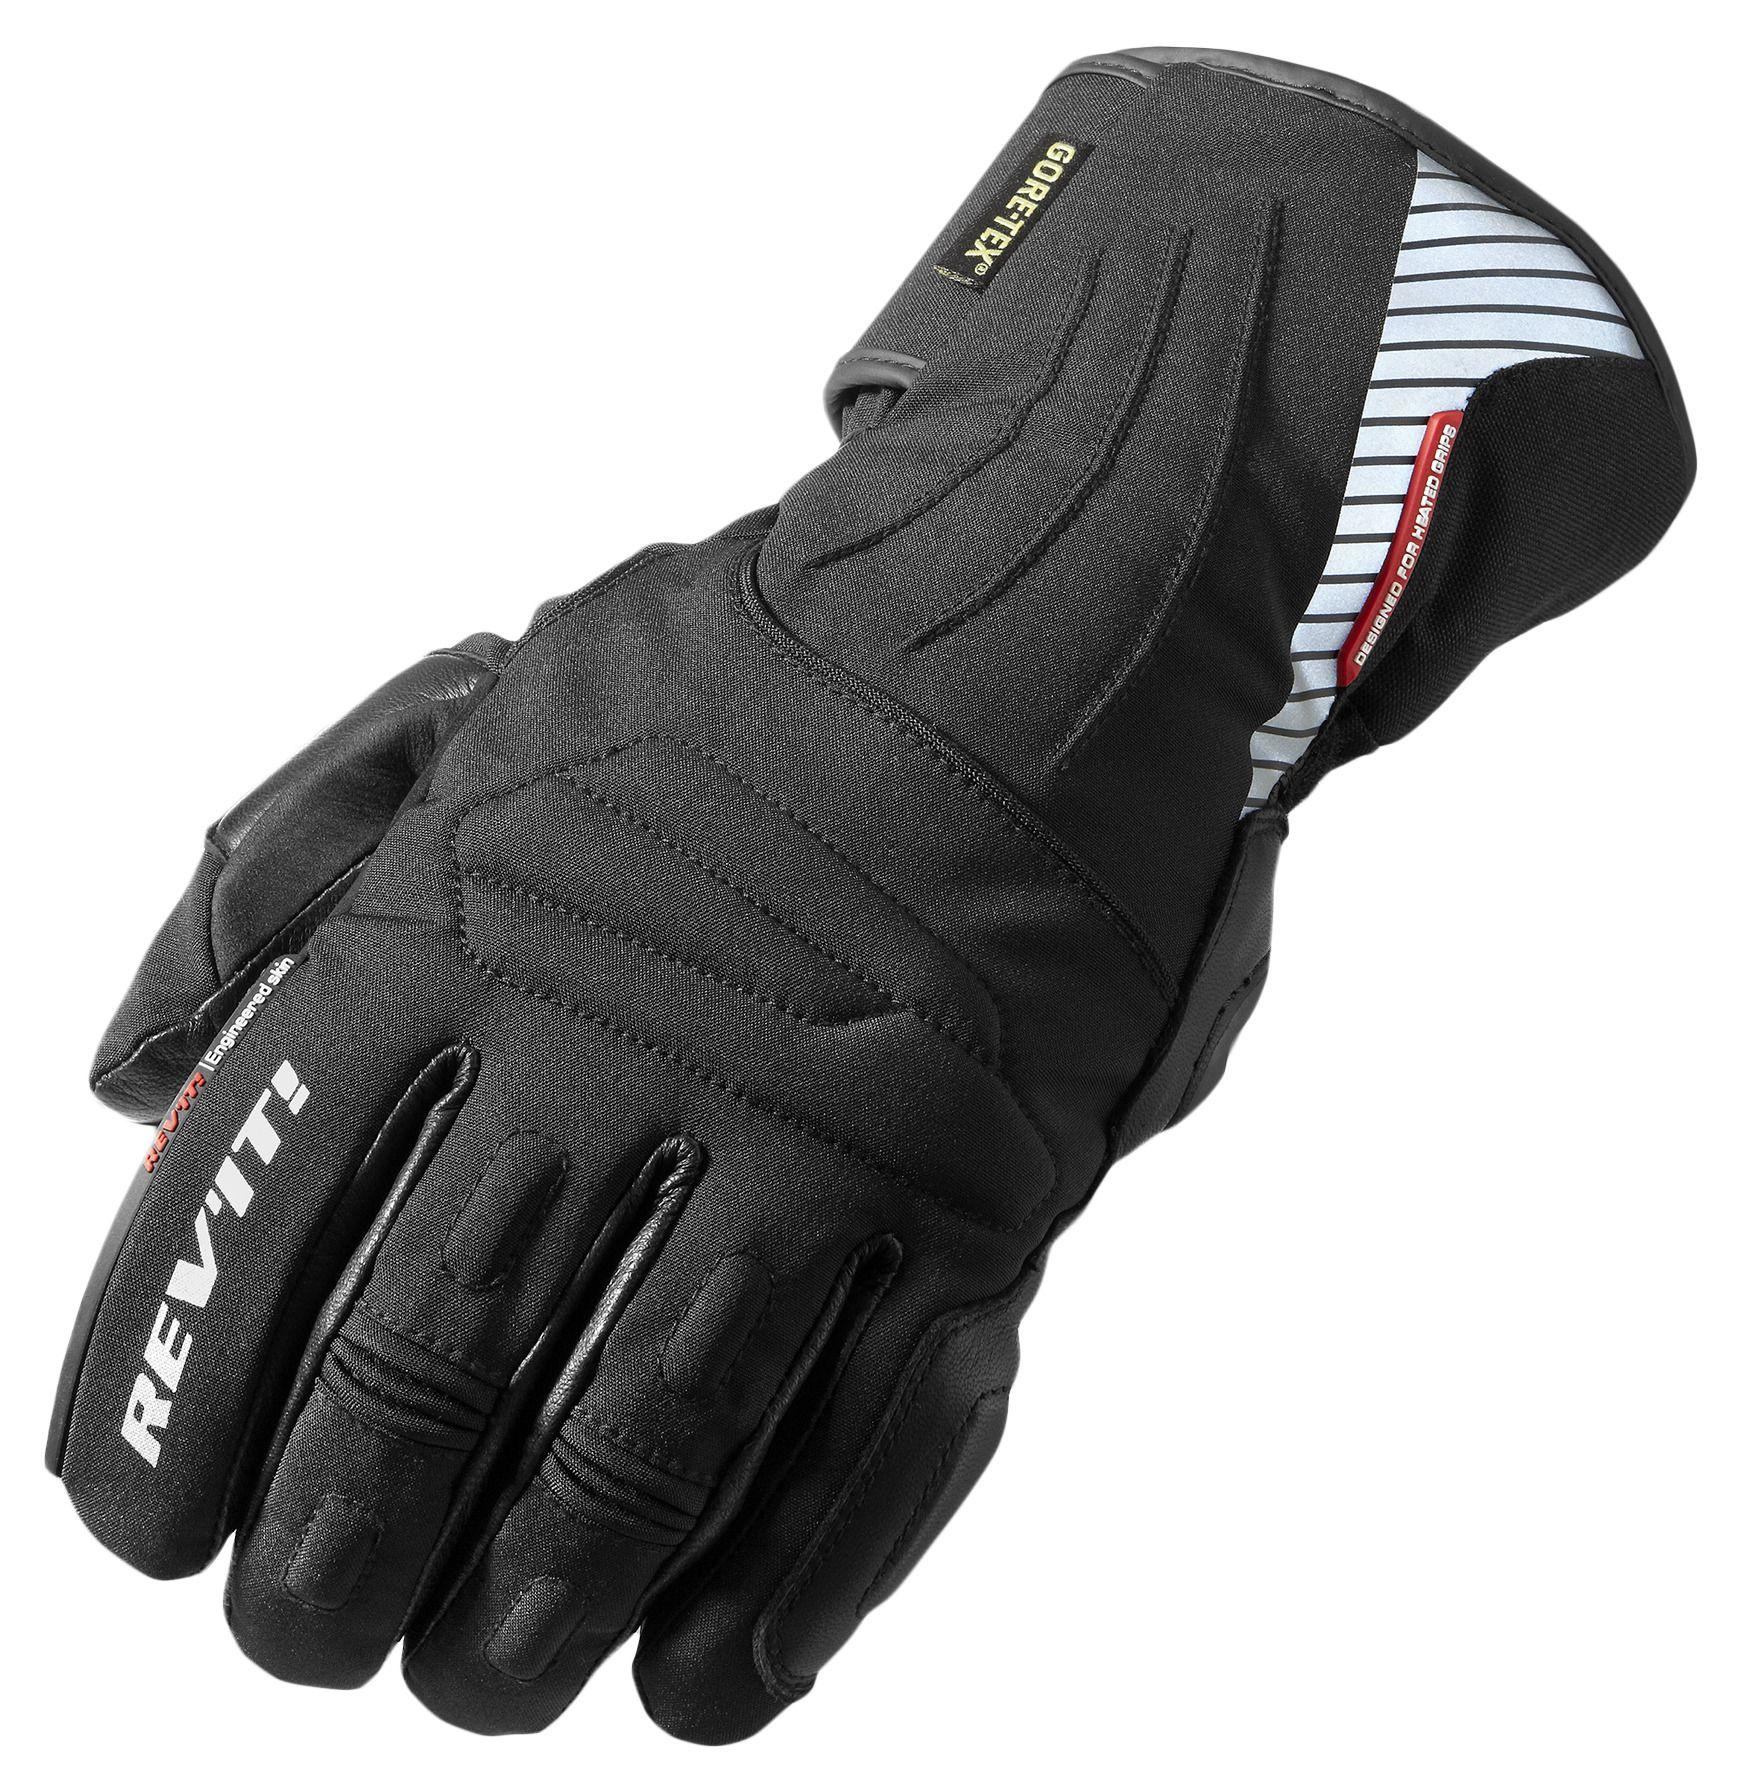 cfccdb7a75853 REV'IT! Fusion GTX Gloves - RevZilla